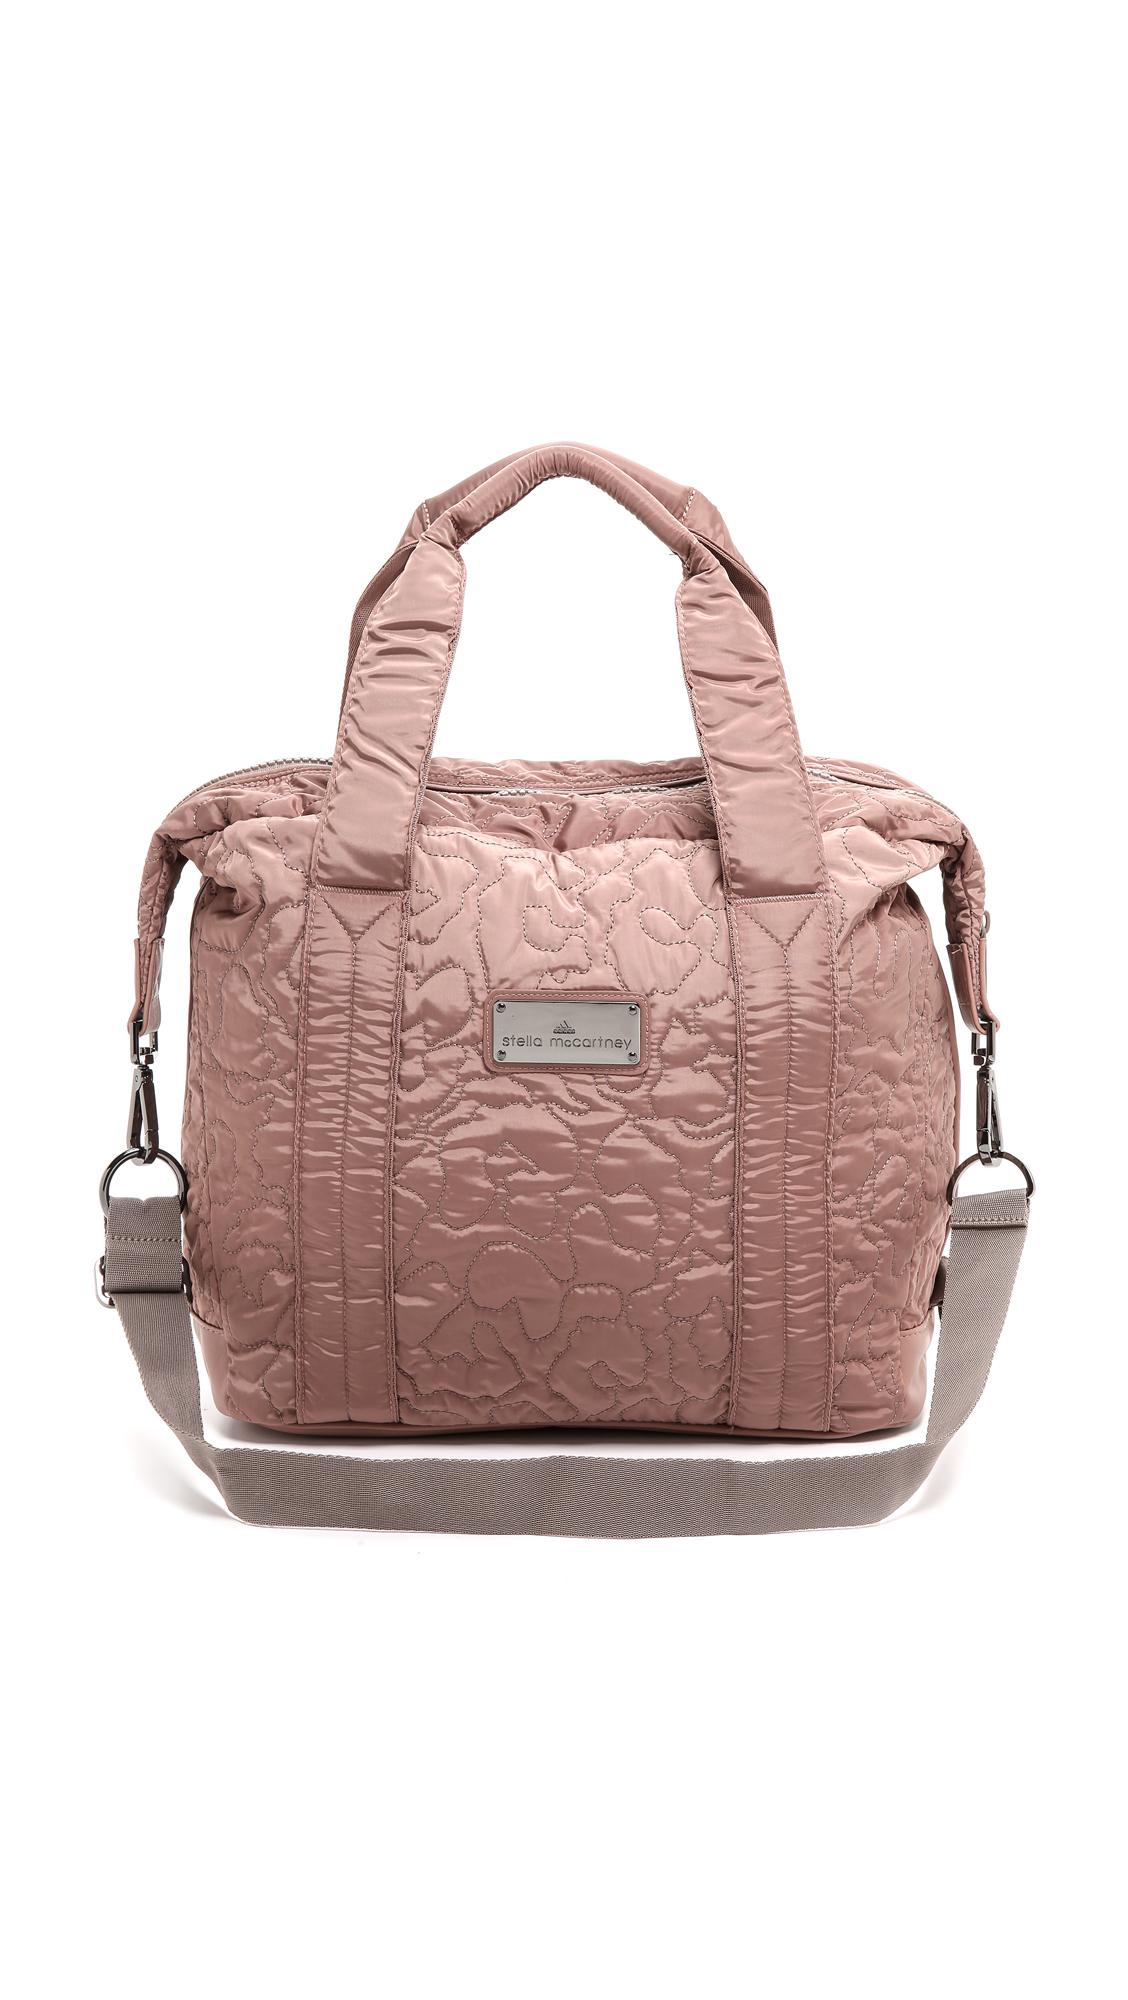 Lyst - adidas By Stella McCartney Small Gym Bag - Tan in Pink d002e711b6